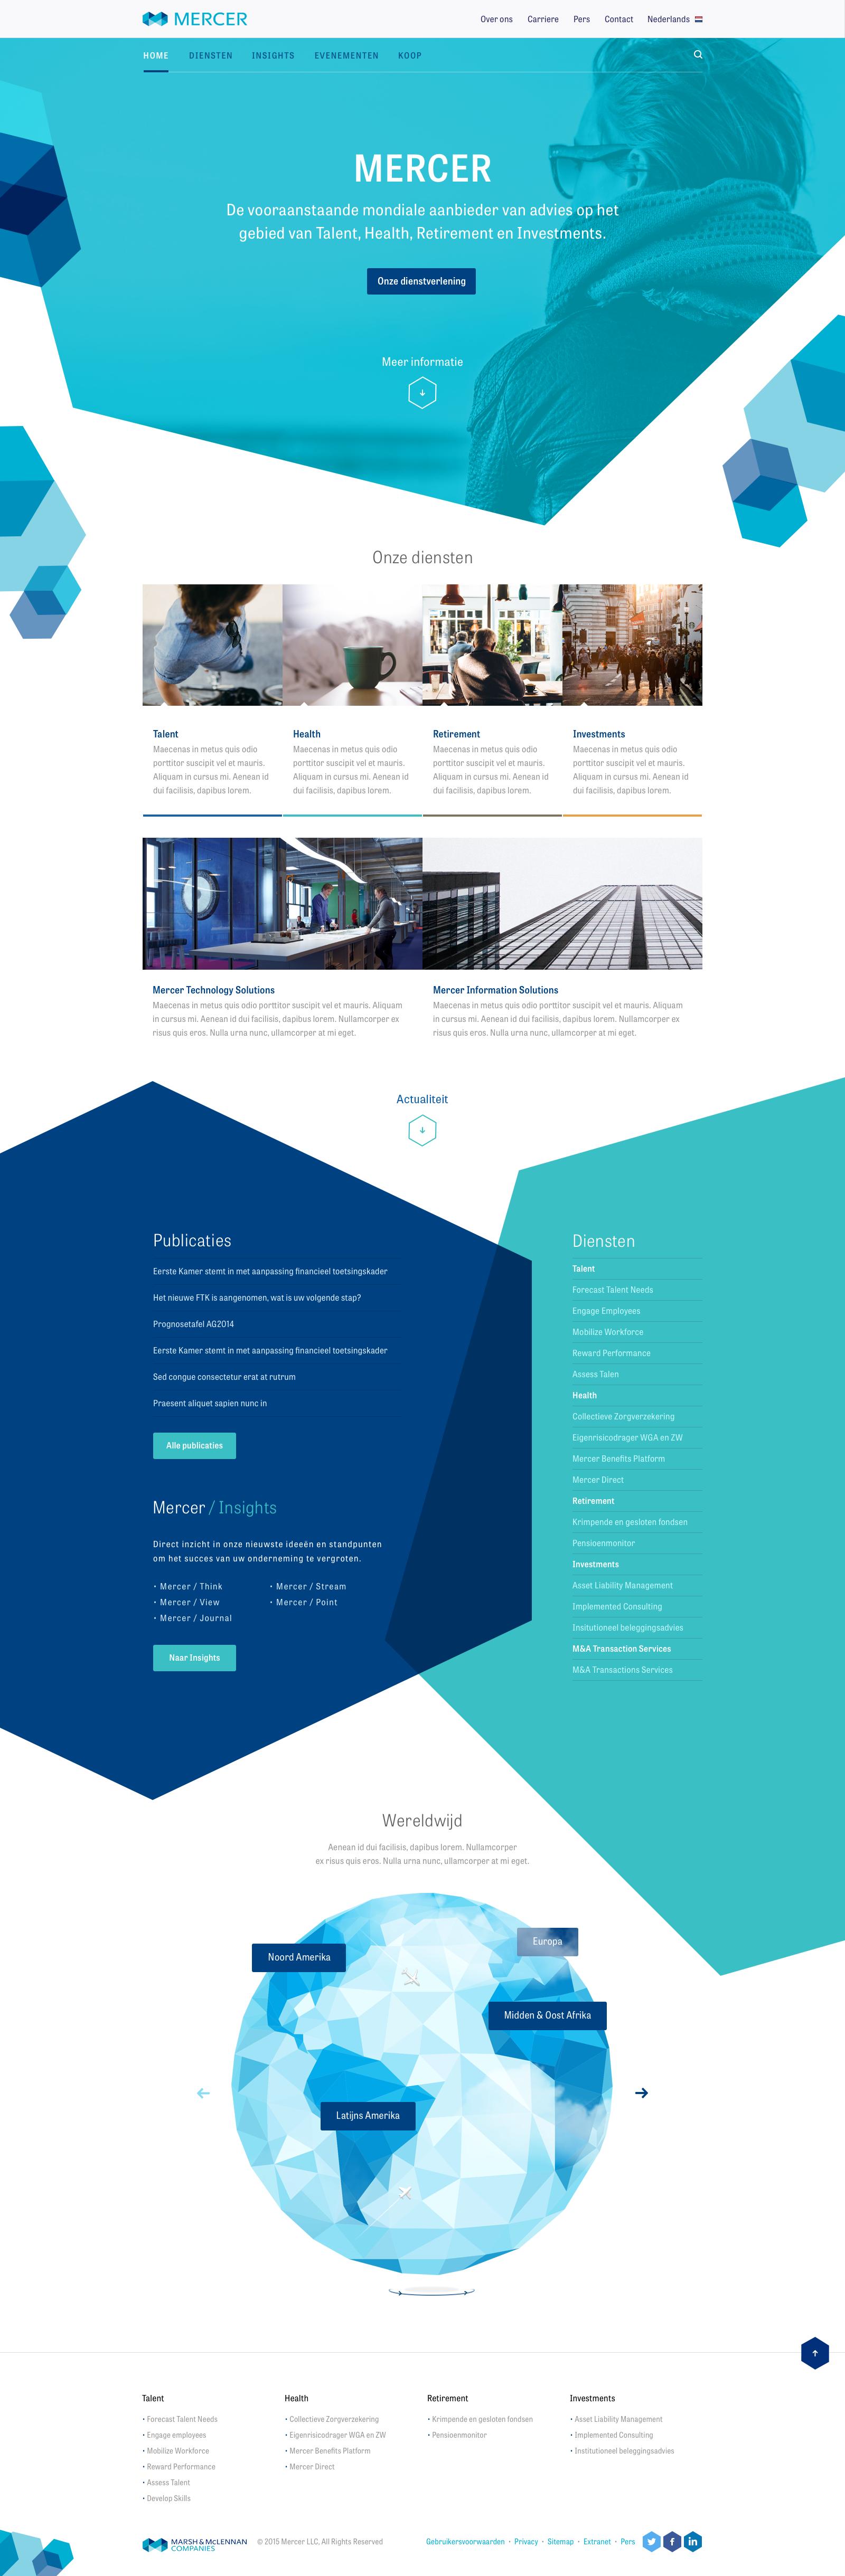 How To Effectively Use Transparent Backgrounds In Graphic Design Design School Web Layout Design Web Design Website Design Inspiration